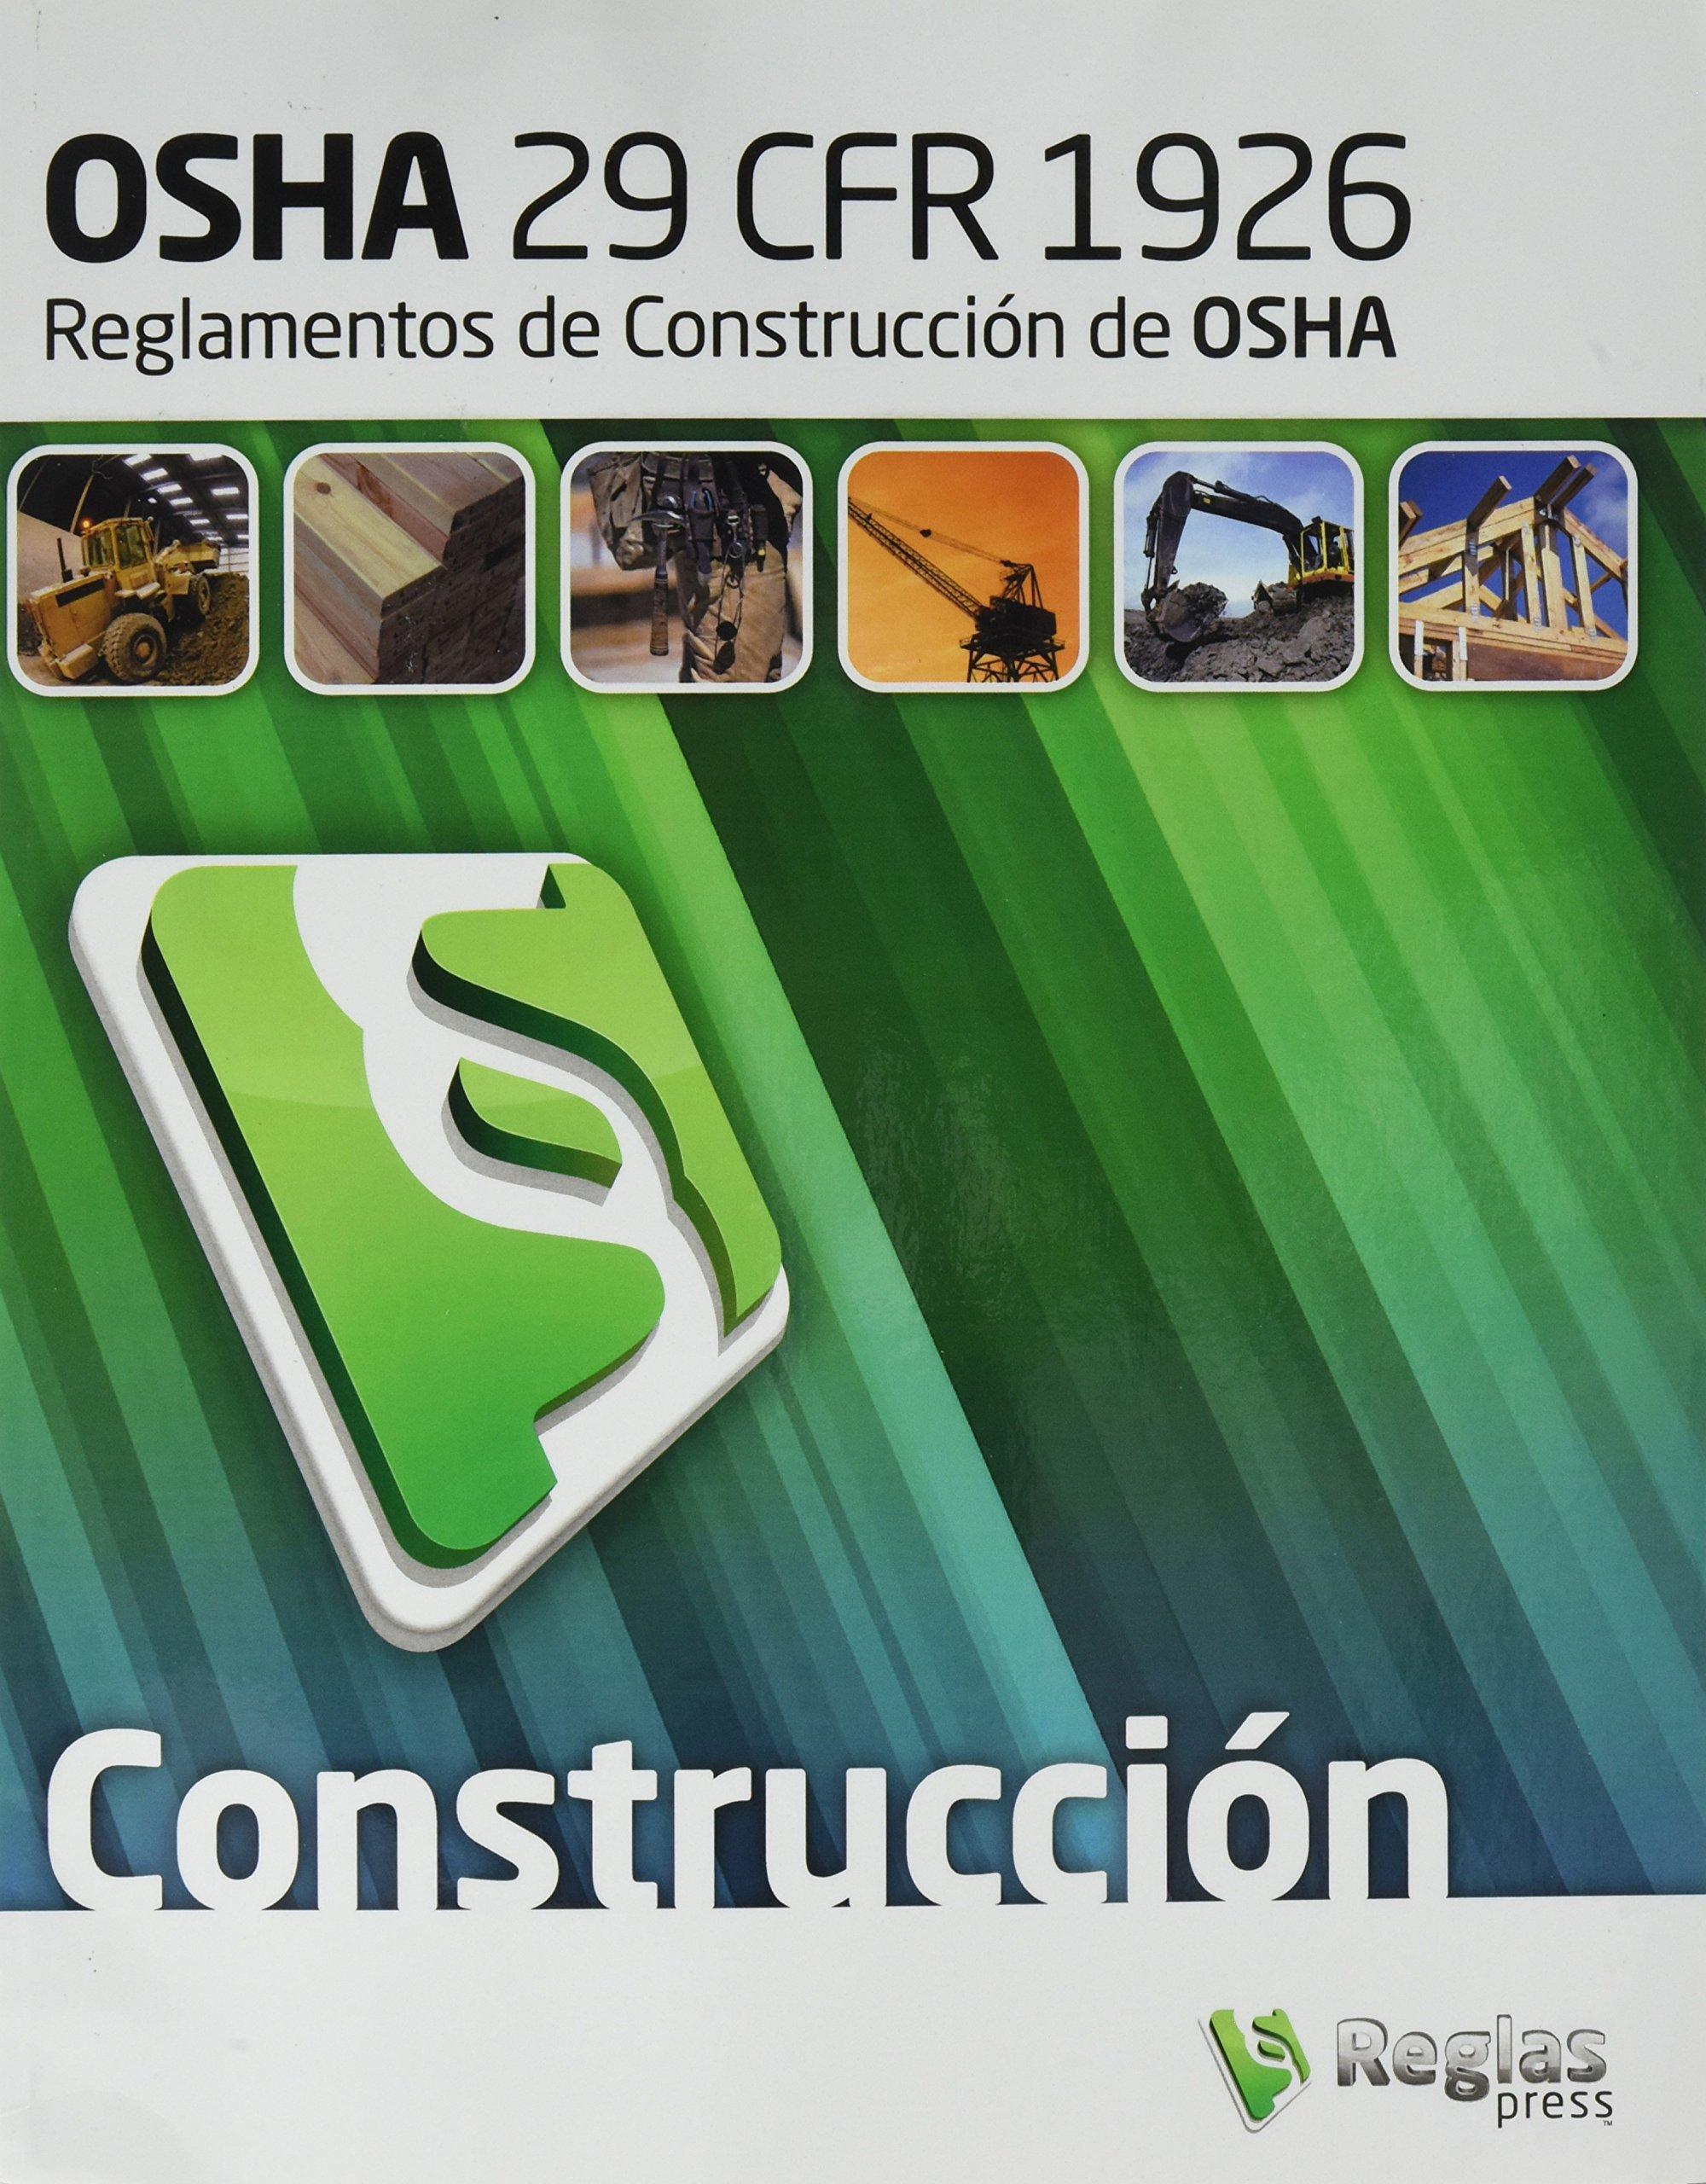 29 CFR 1926 OSHA Construction Standards and Regulations